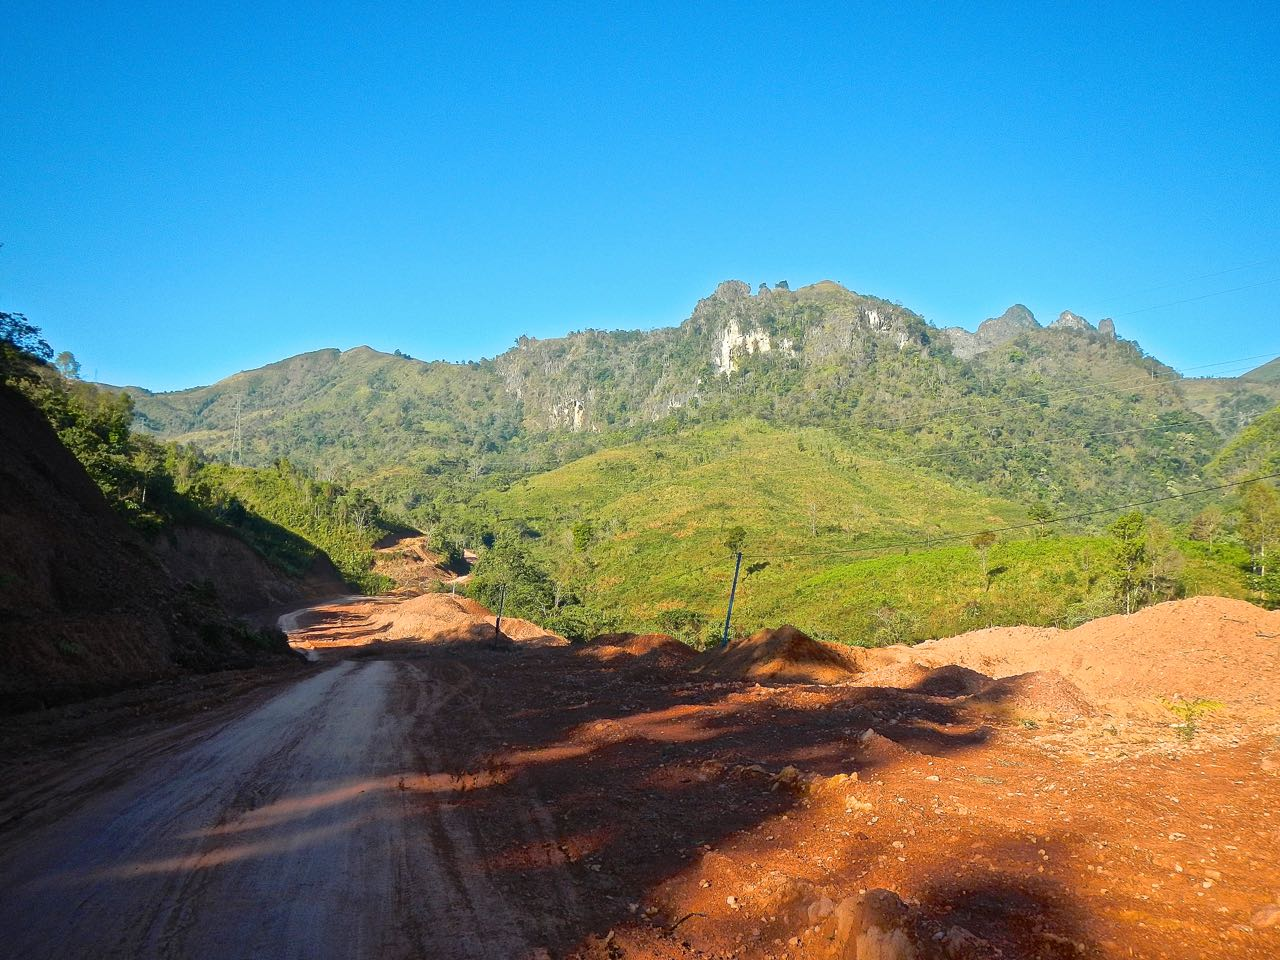 The Phou Bia Summit |